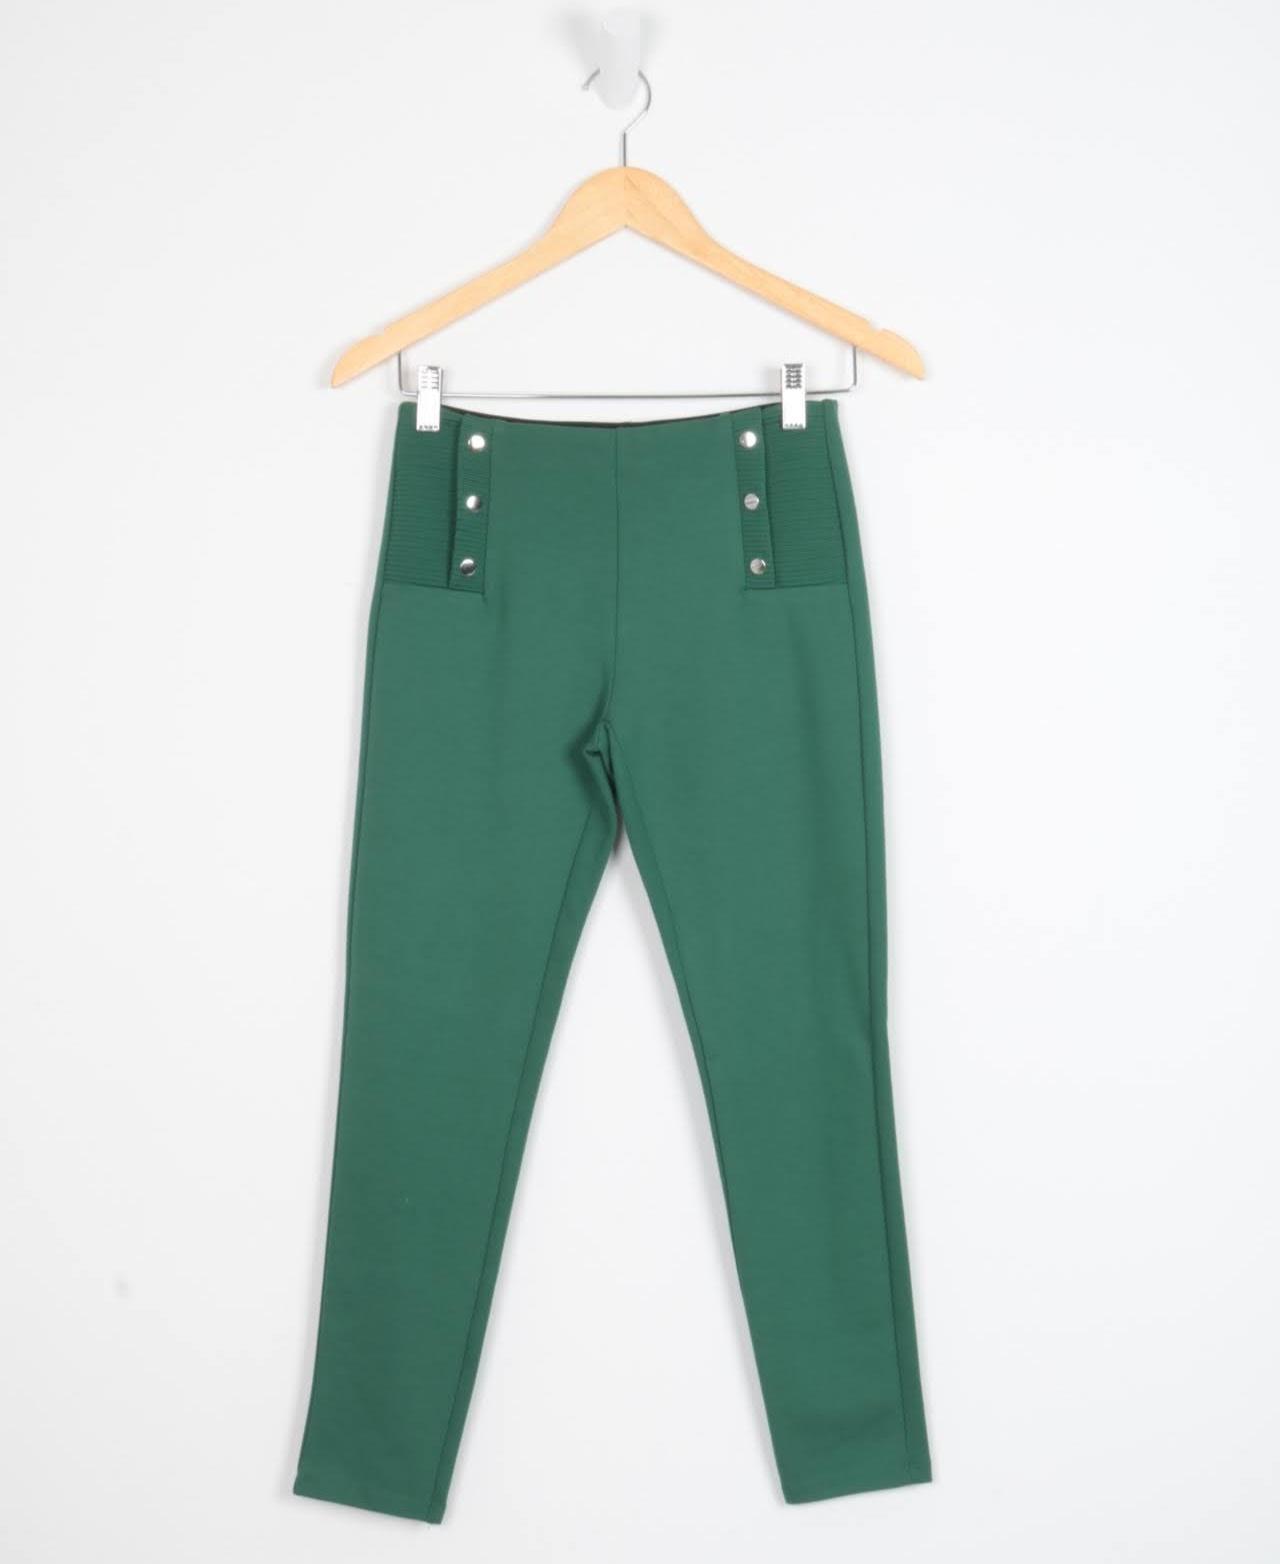 Legging - Zara - 12 Anos